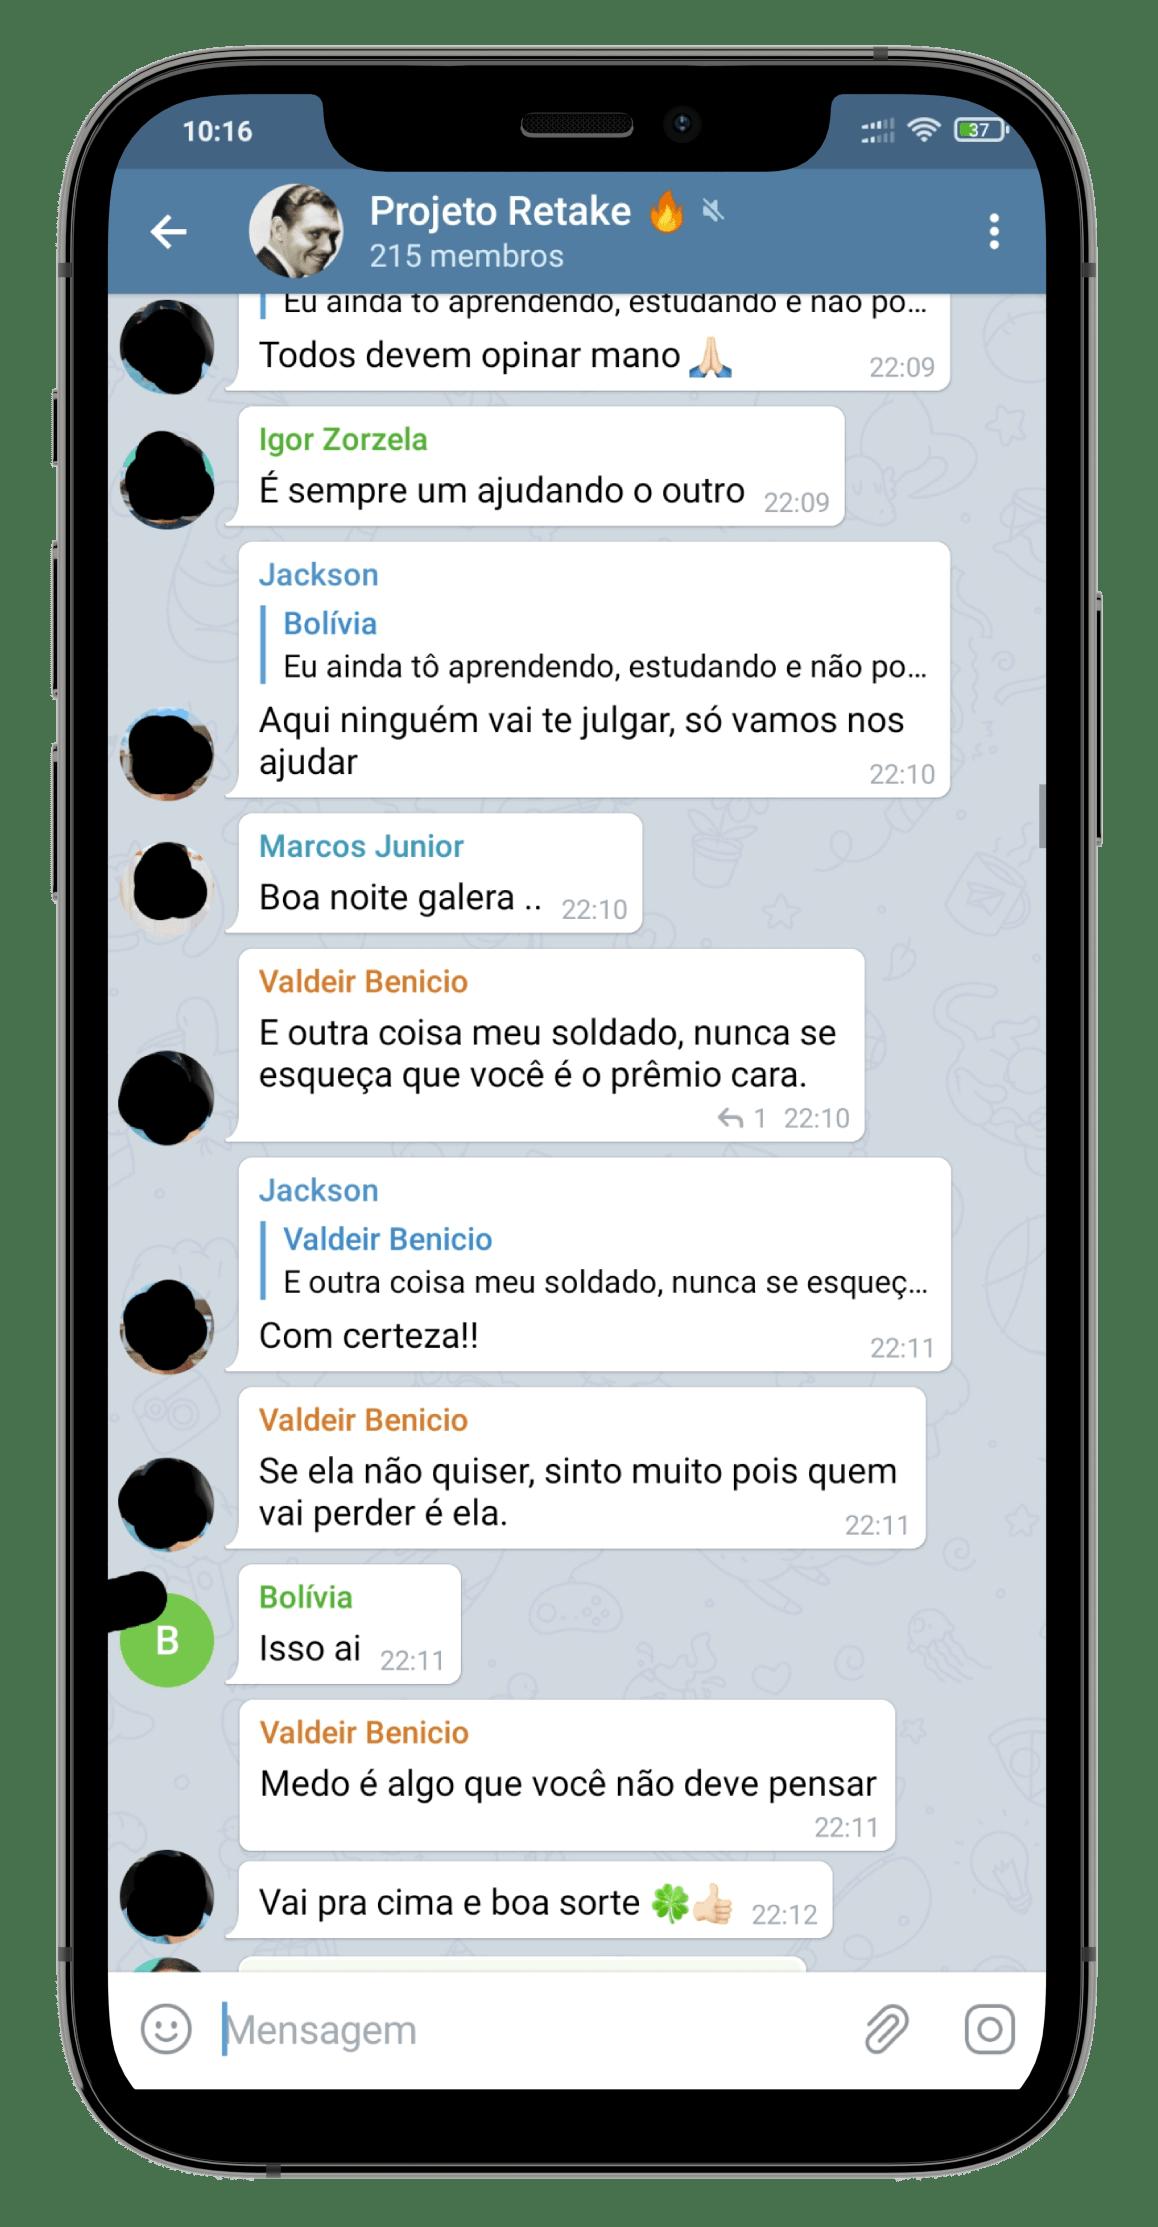 projeto-retake-telegram-2.png